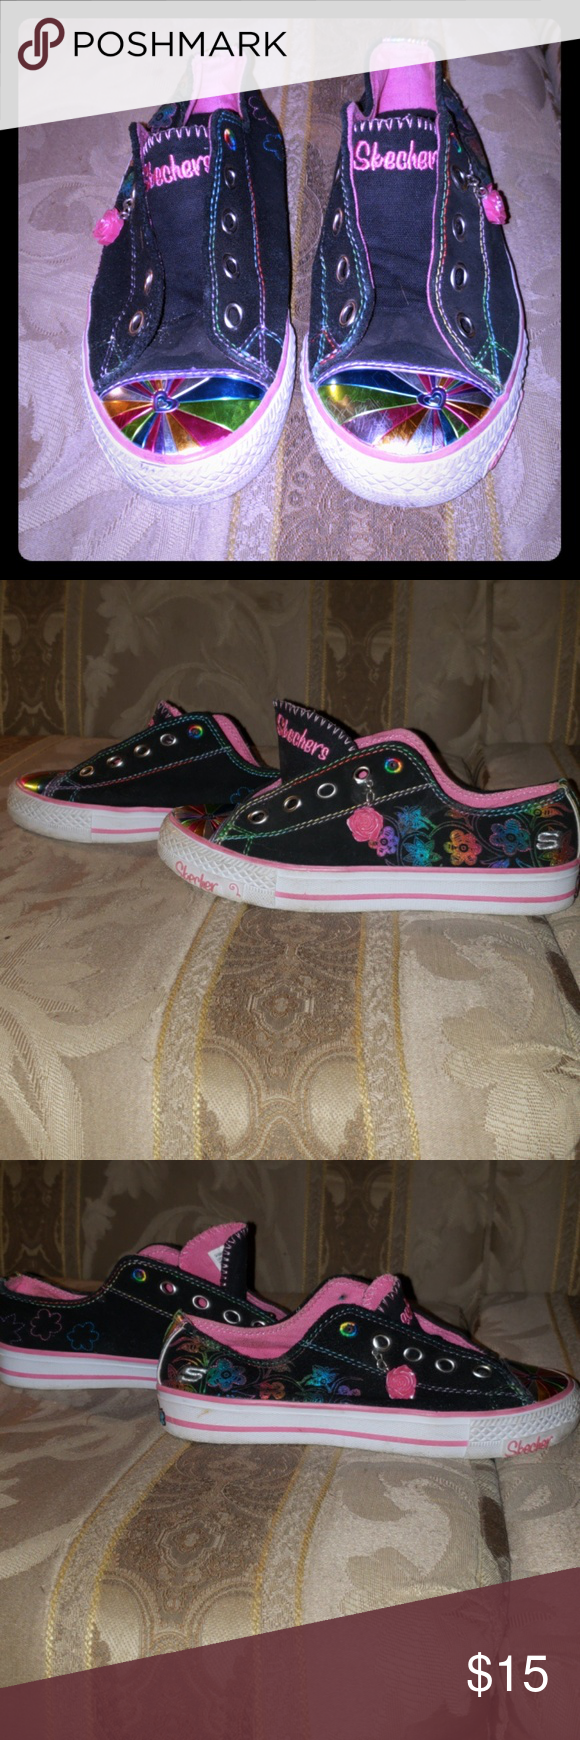 ❤ Girls Sketchers Sneakers size 2